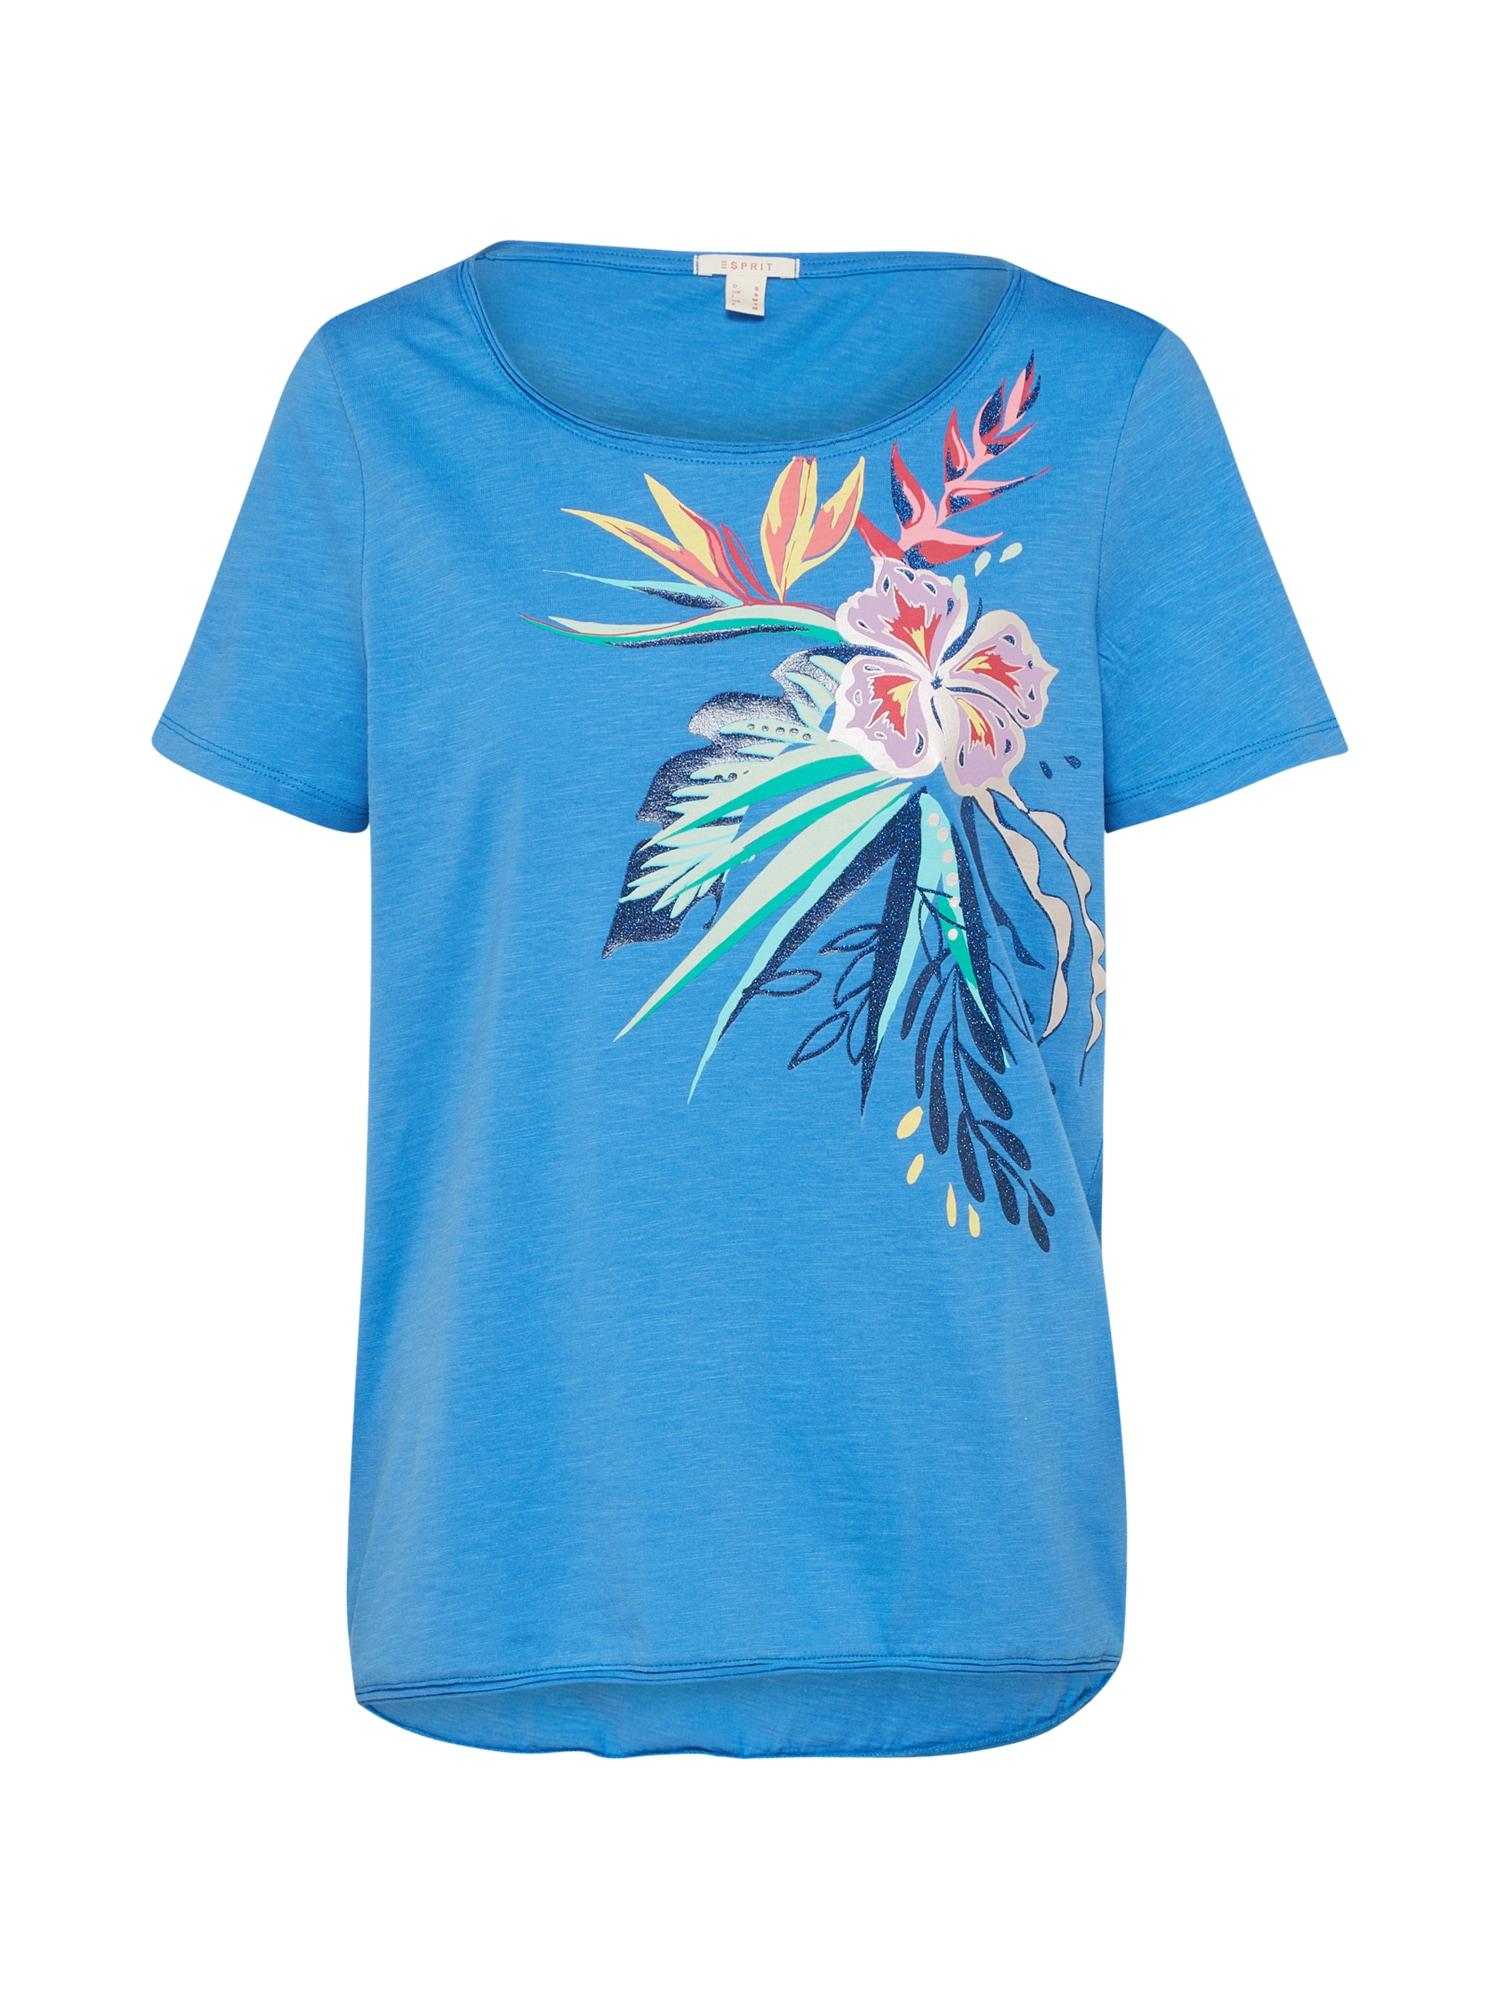 Tričko Tropical Tee nebeská modř mix barev ESPRIT